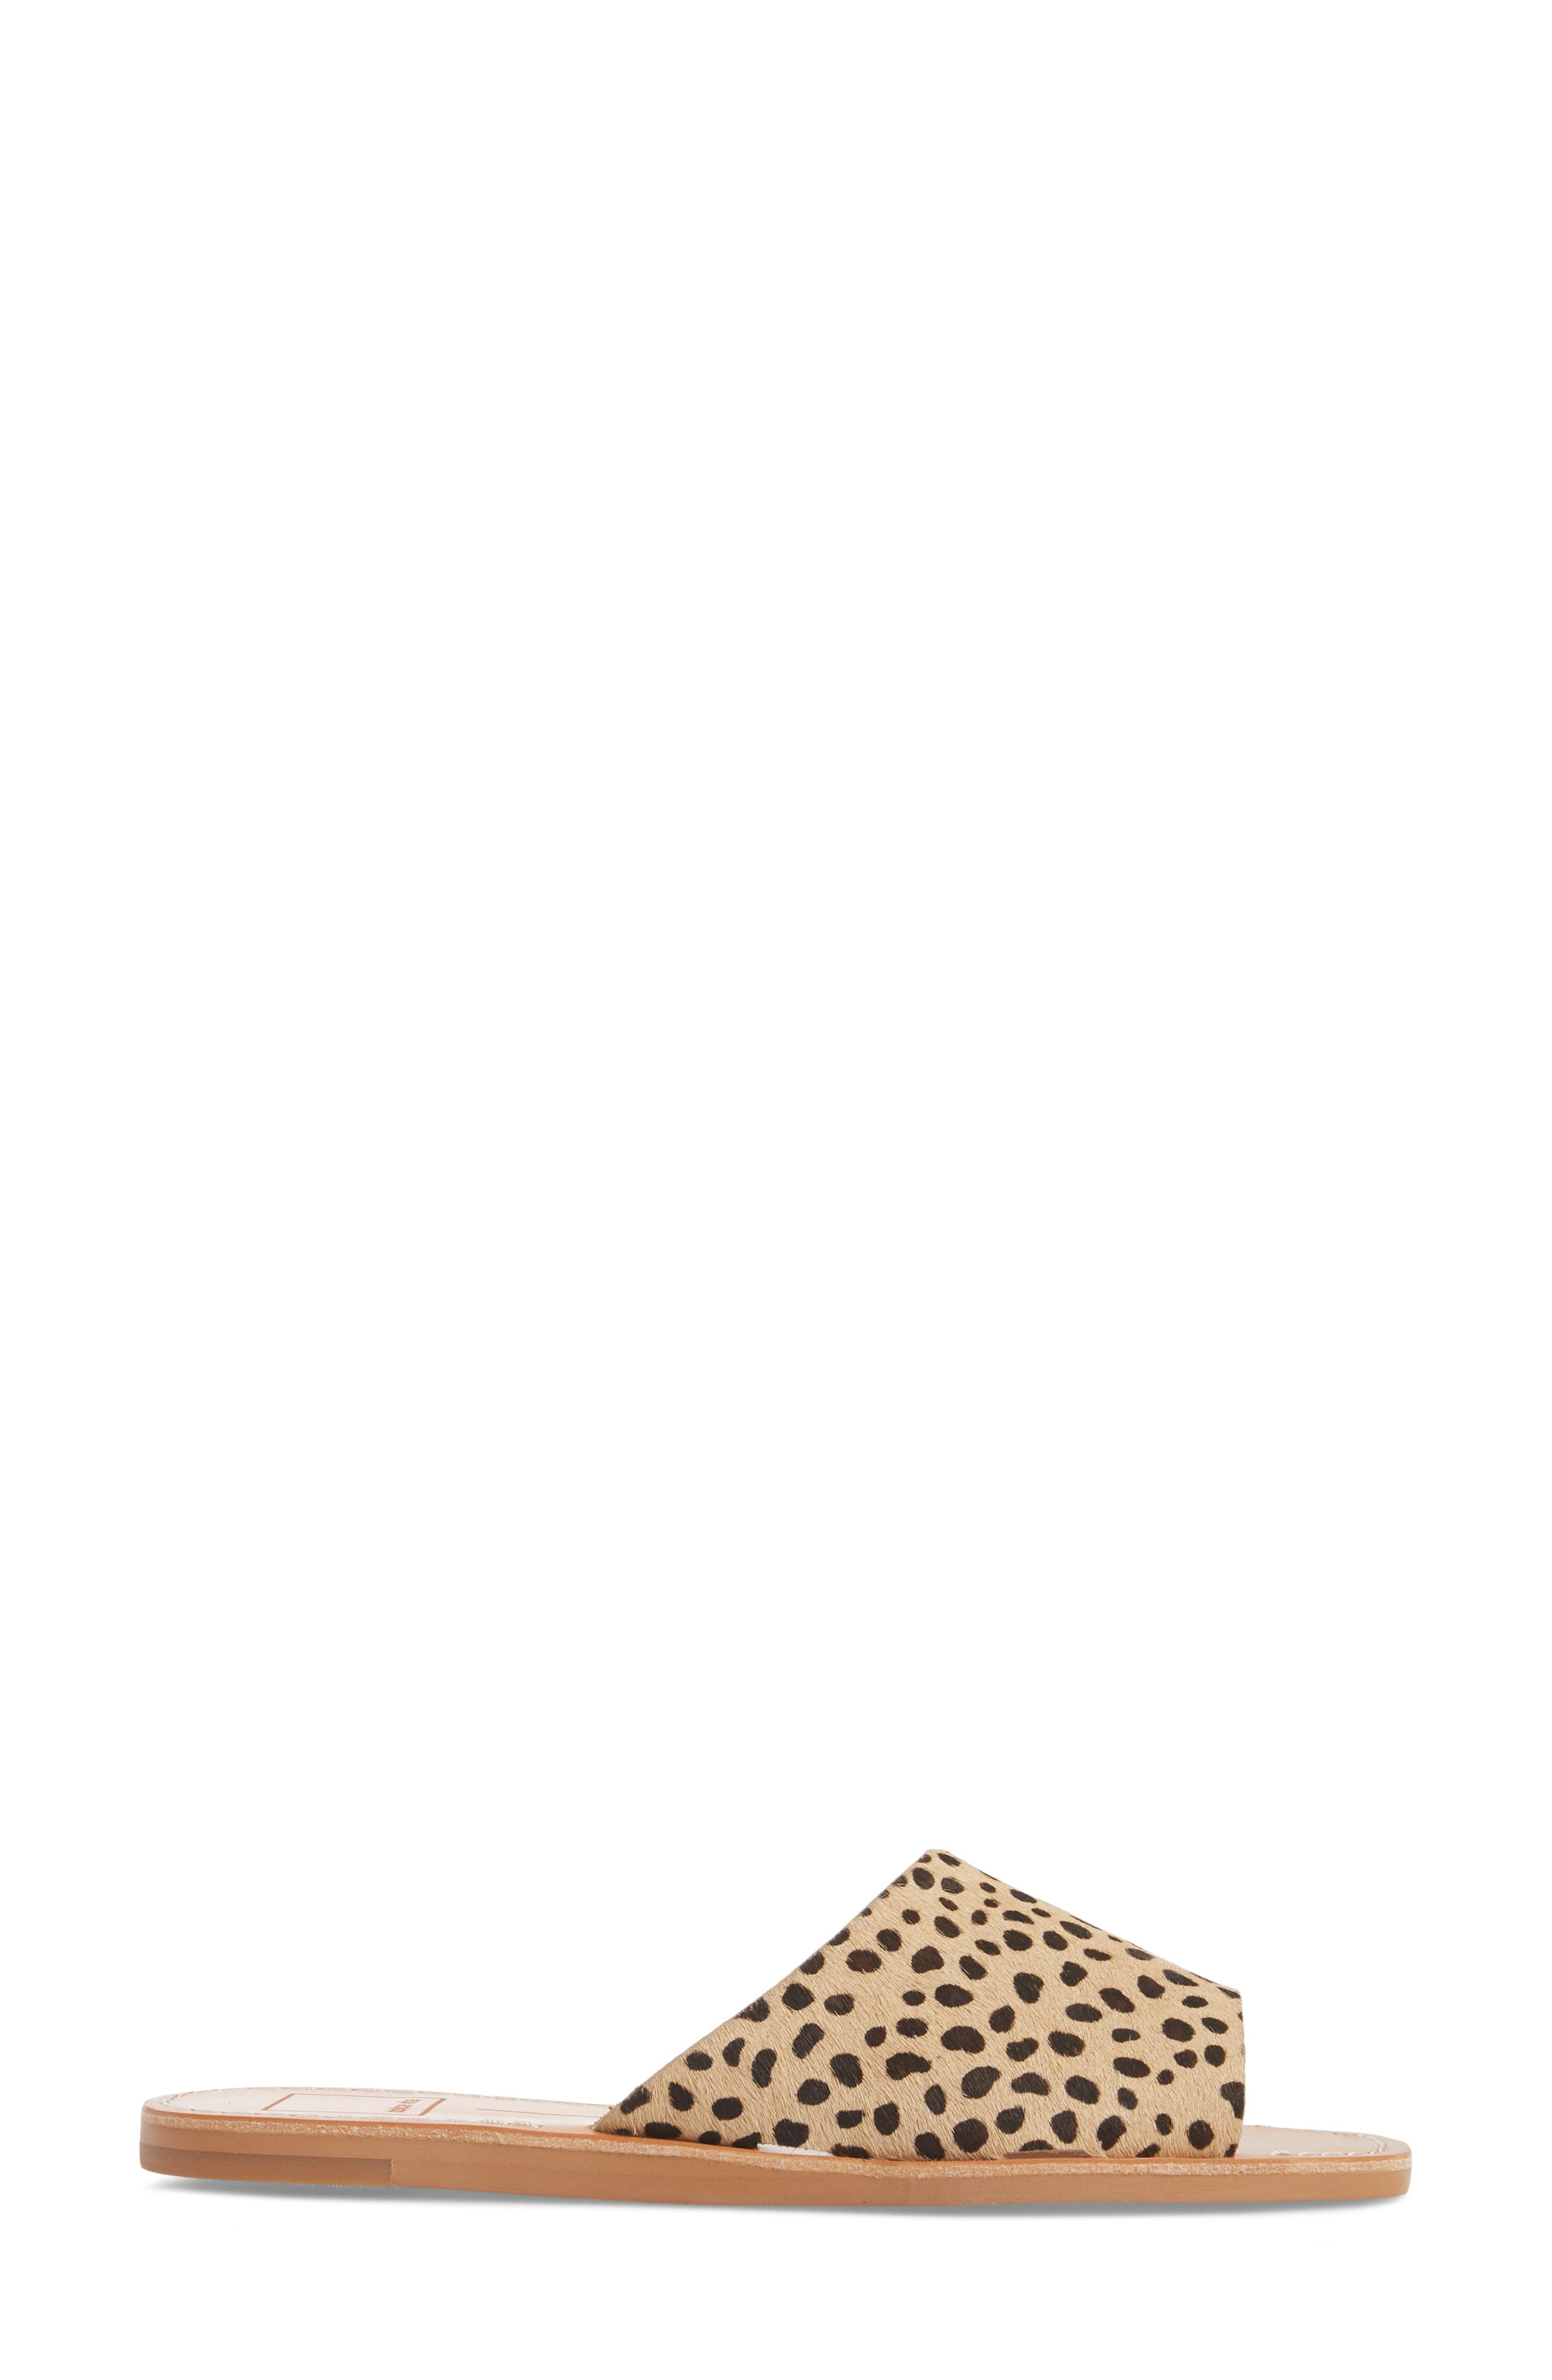 Cato Genuine Calf Hair Slide Sandal,                             Alternate thumbnail 3, color,                             Leopard Calf Hair